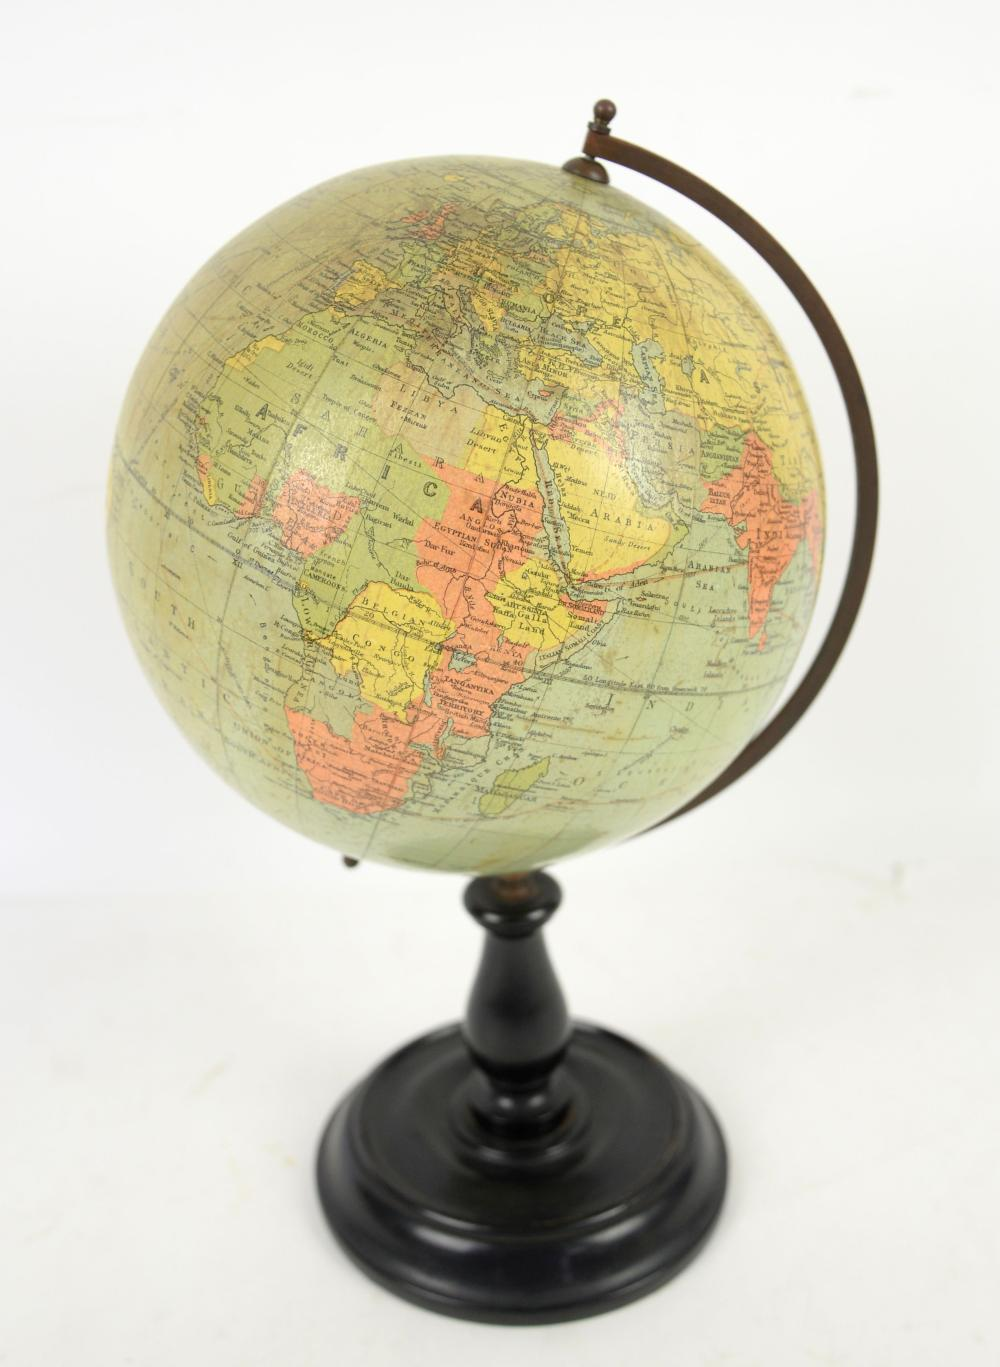 Philips terrestrial globe, on wooden pedestal base